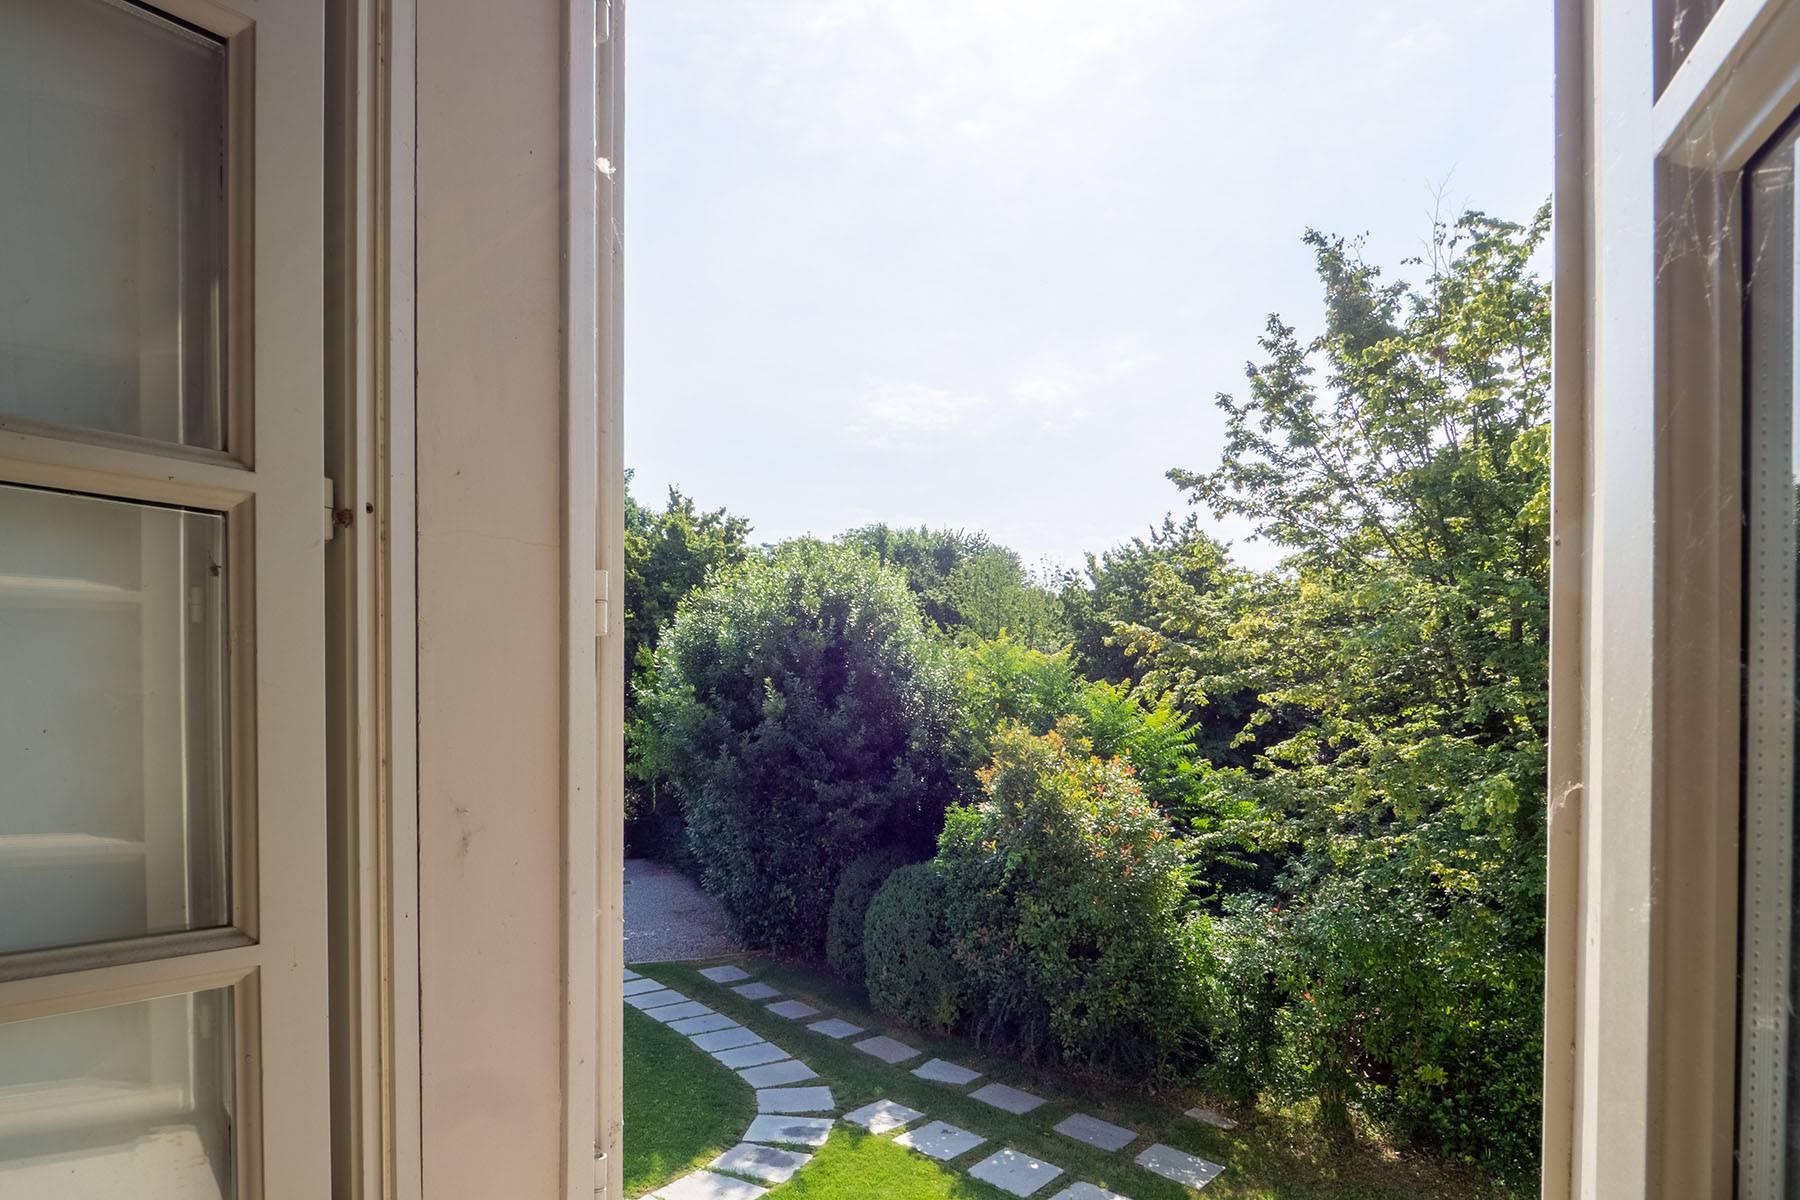 Casa indipendente in Vendita a Torino: 5 locali, 400 mq - Foto 9